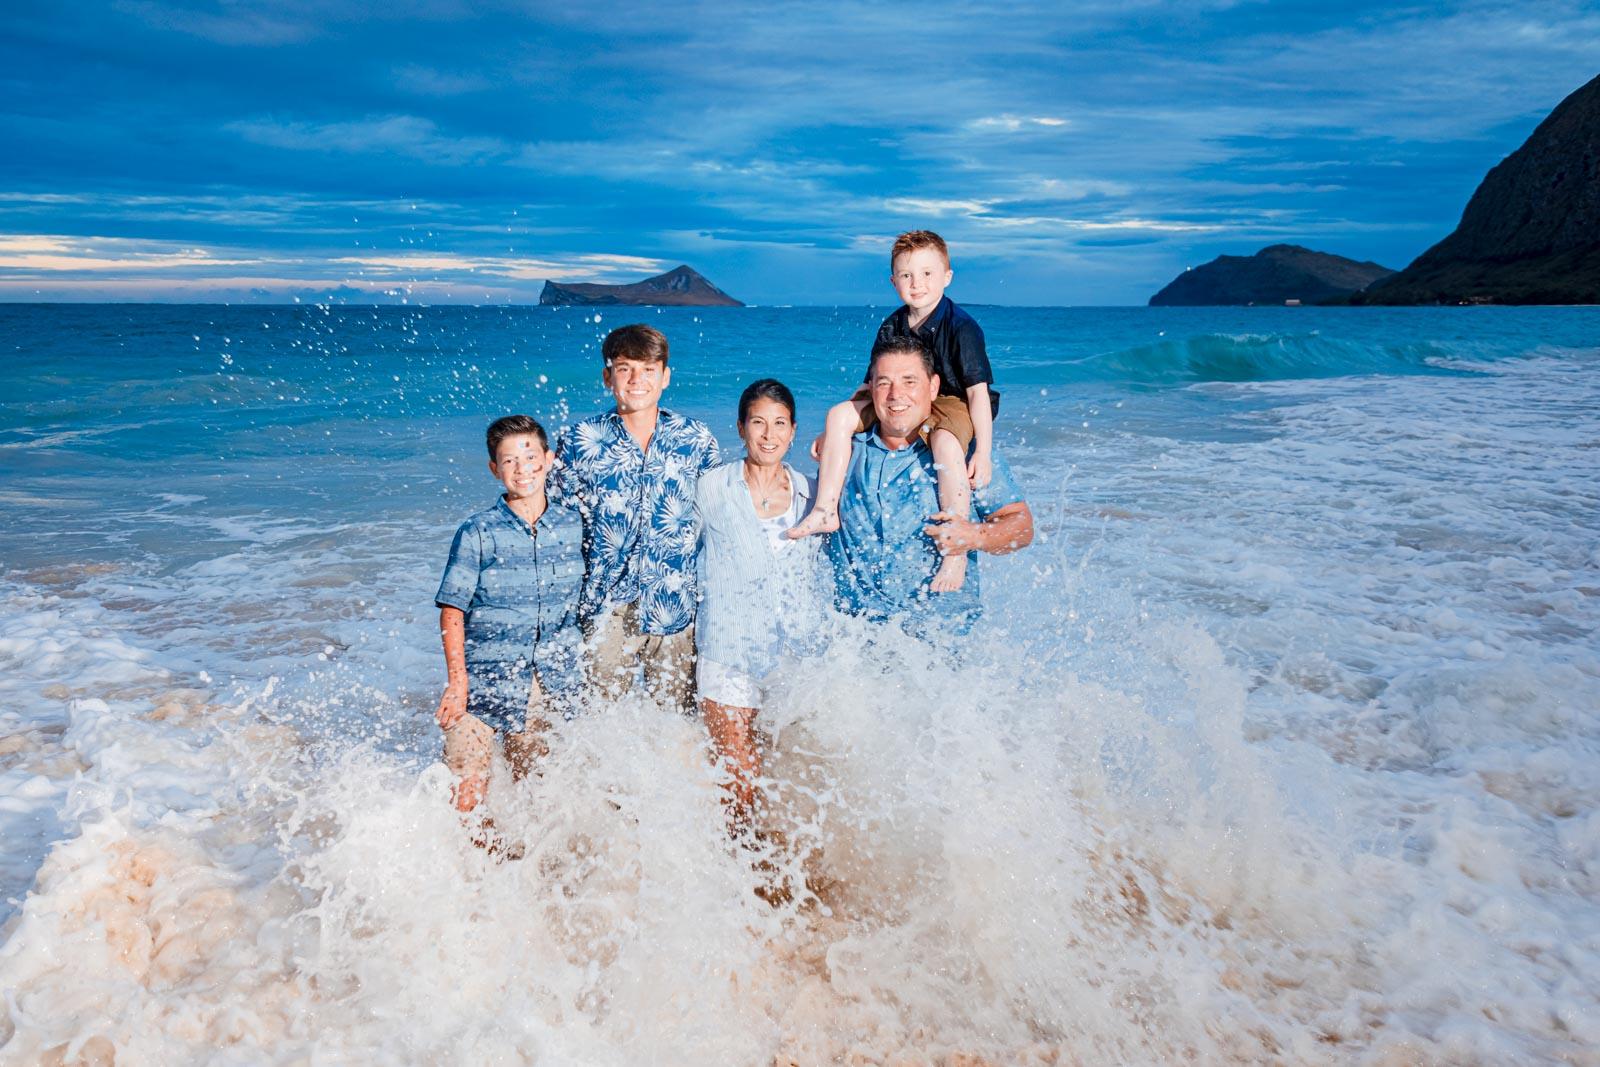 family sunset ocean beach vacation photogaphy oahu hawaii